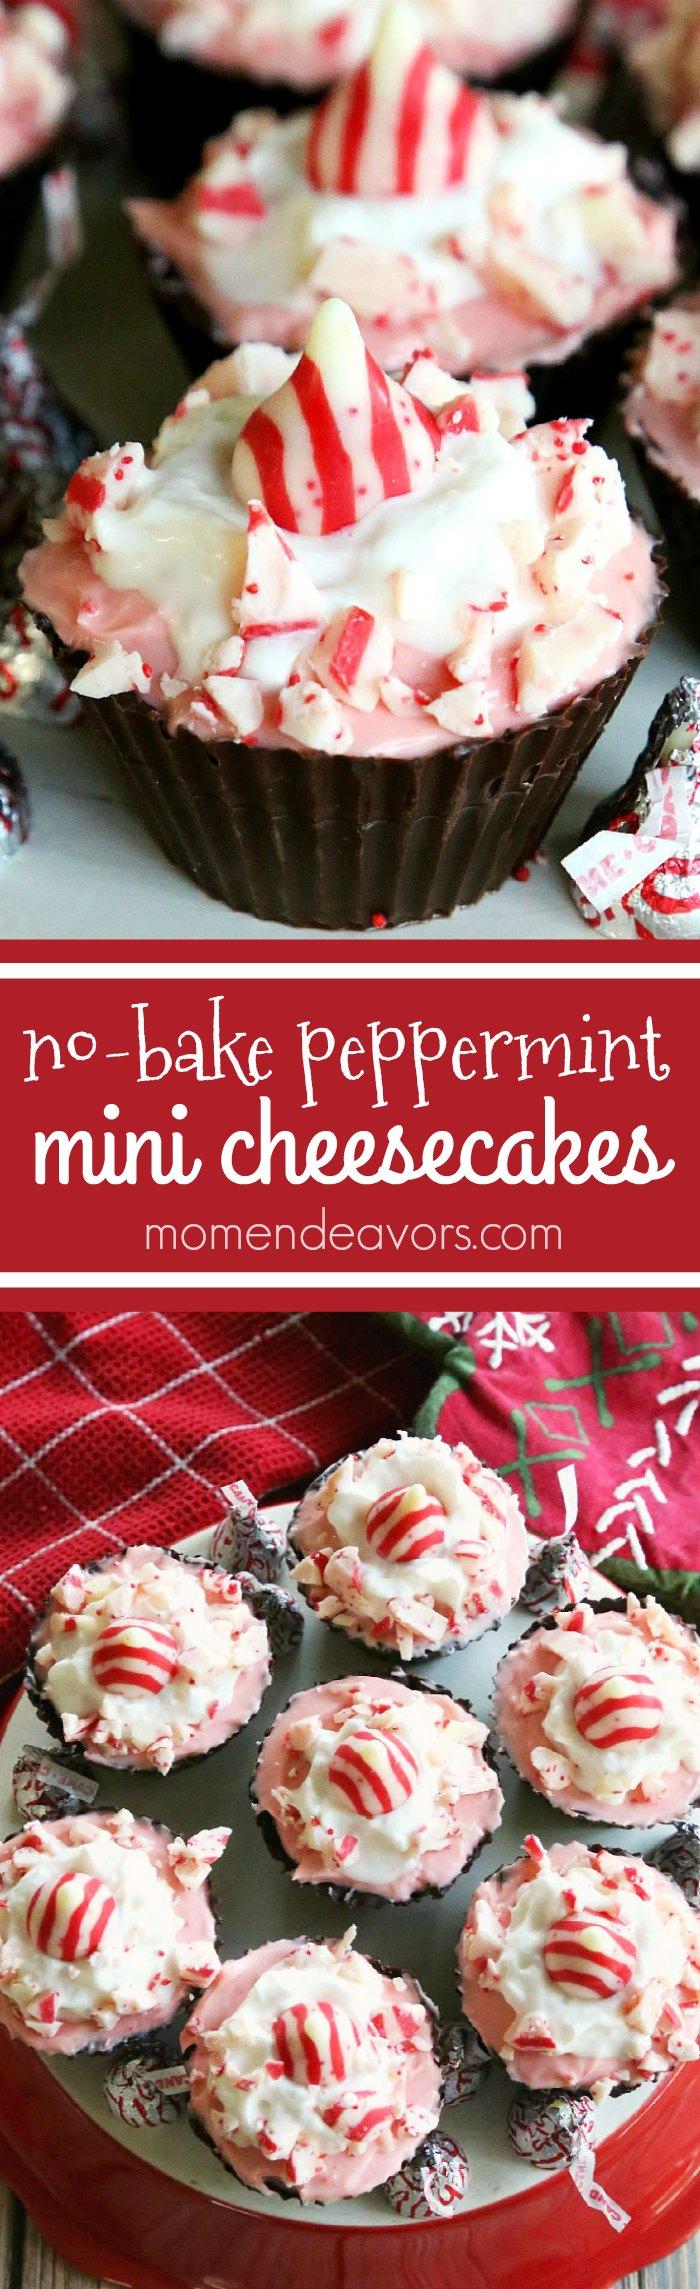 No-Bake Mini Peppermint Cheesecakes